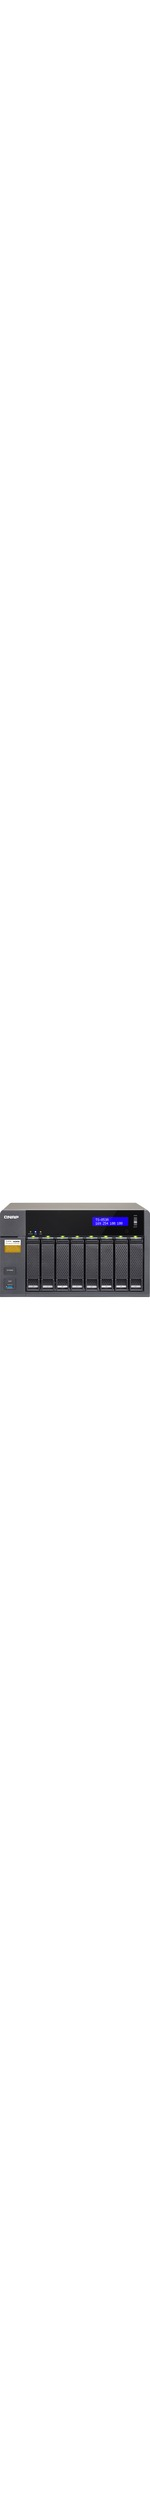 QNAP Turbo NAS TS-853A 8 x Total Bays NAS Server - Desktop - Intel Celeron N3150 Quad-core 4 Core 1.60 GHz - 4 GB RAM DDR3L SDRAM - Serial ATA/600 - RAID Supported